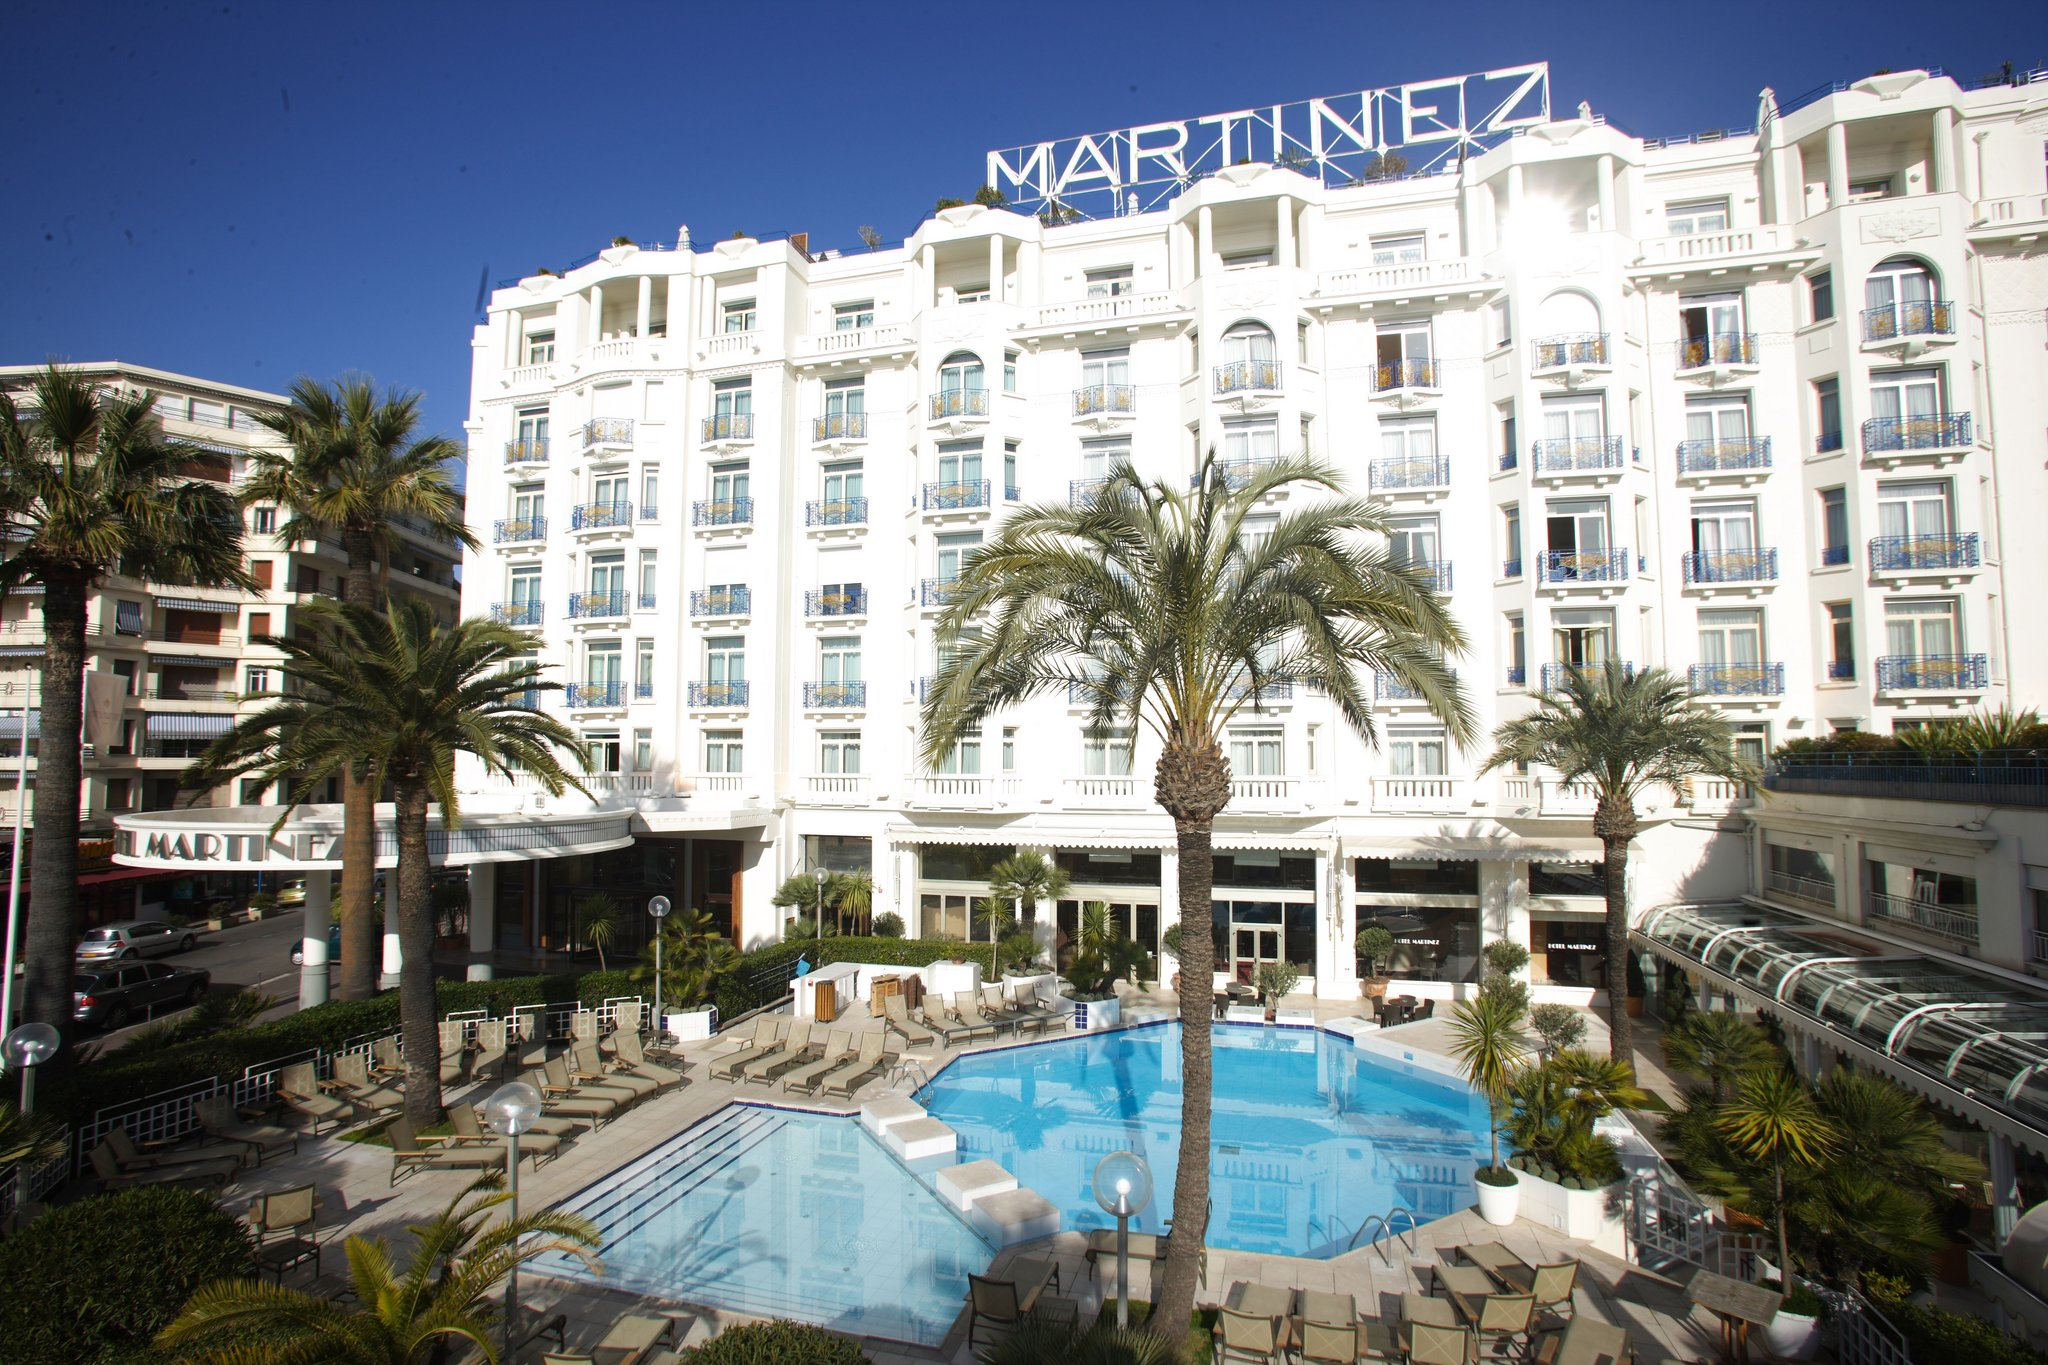 Фото отеля – grand hyatt cannes hotel martinez